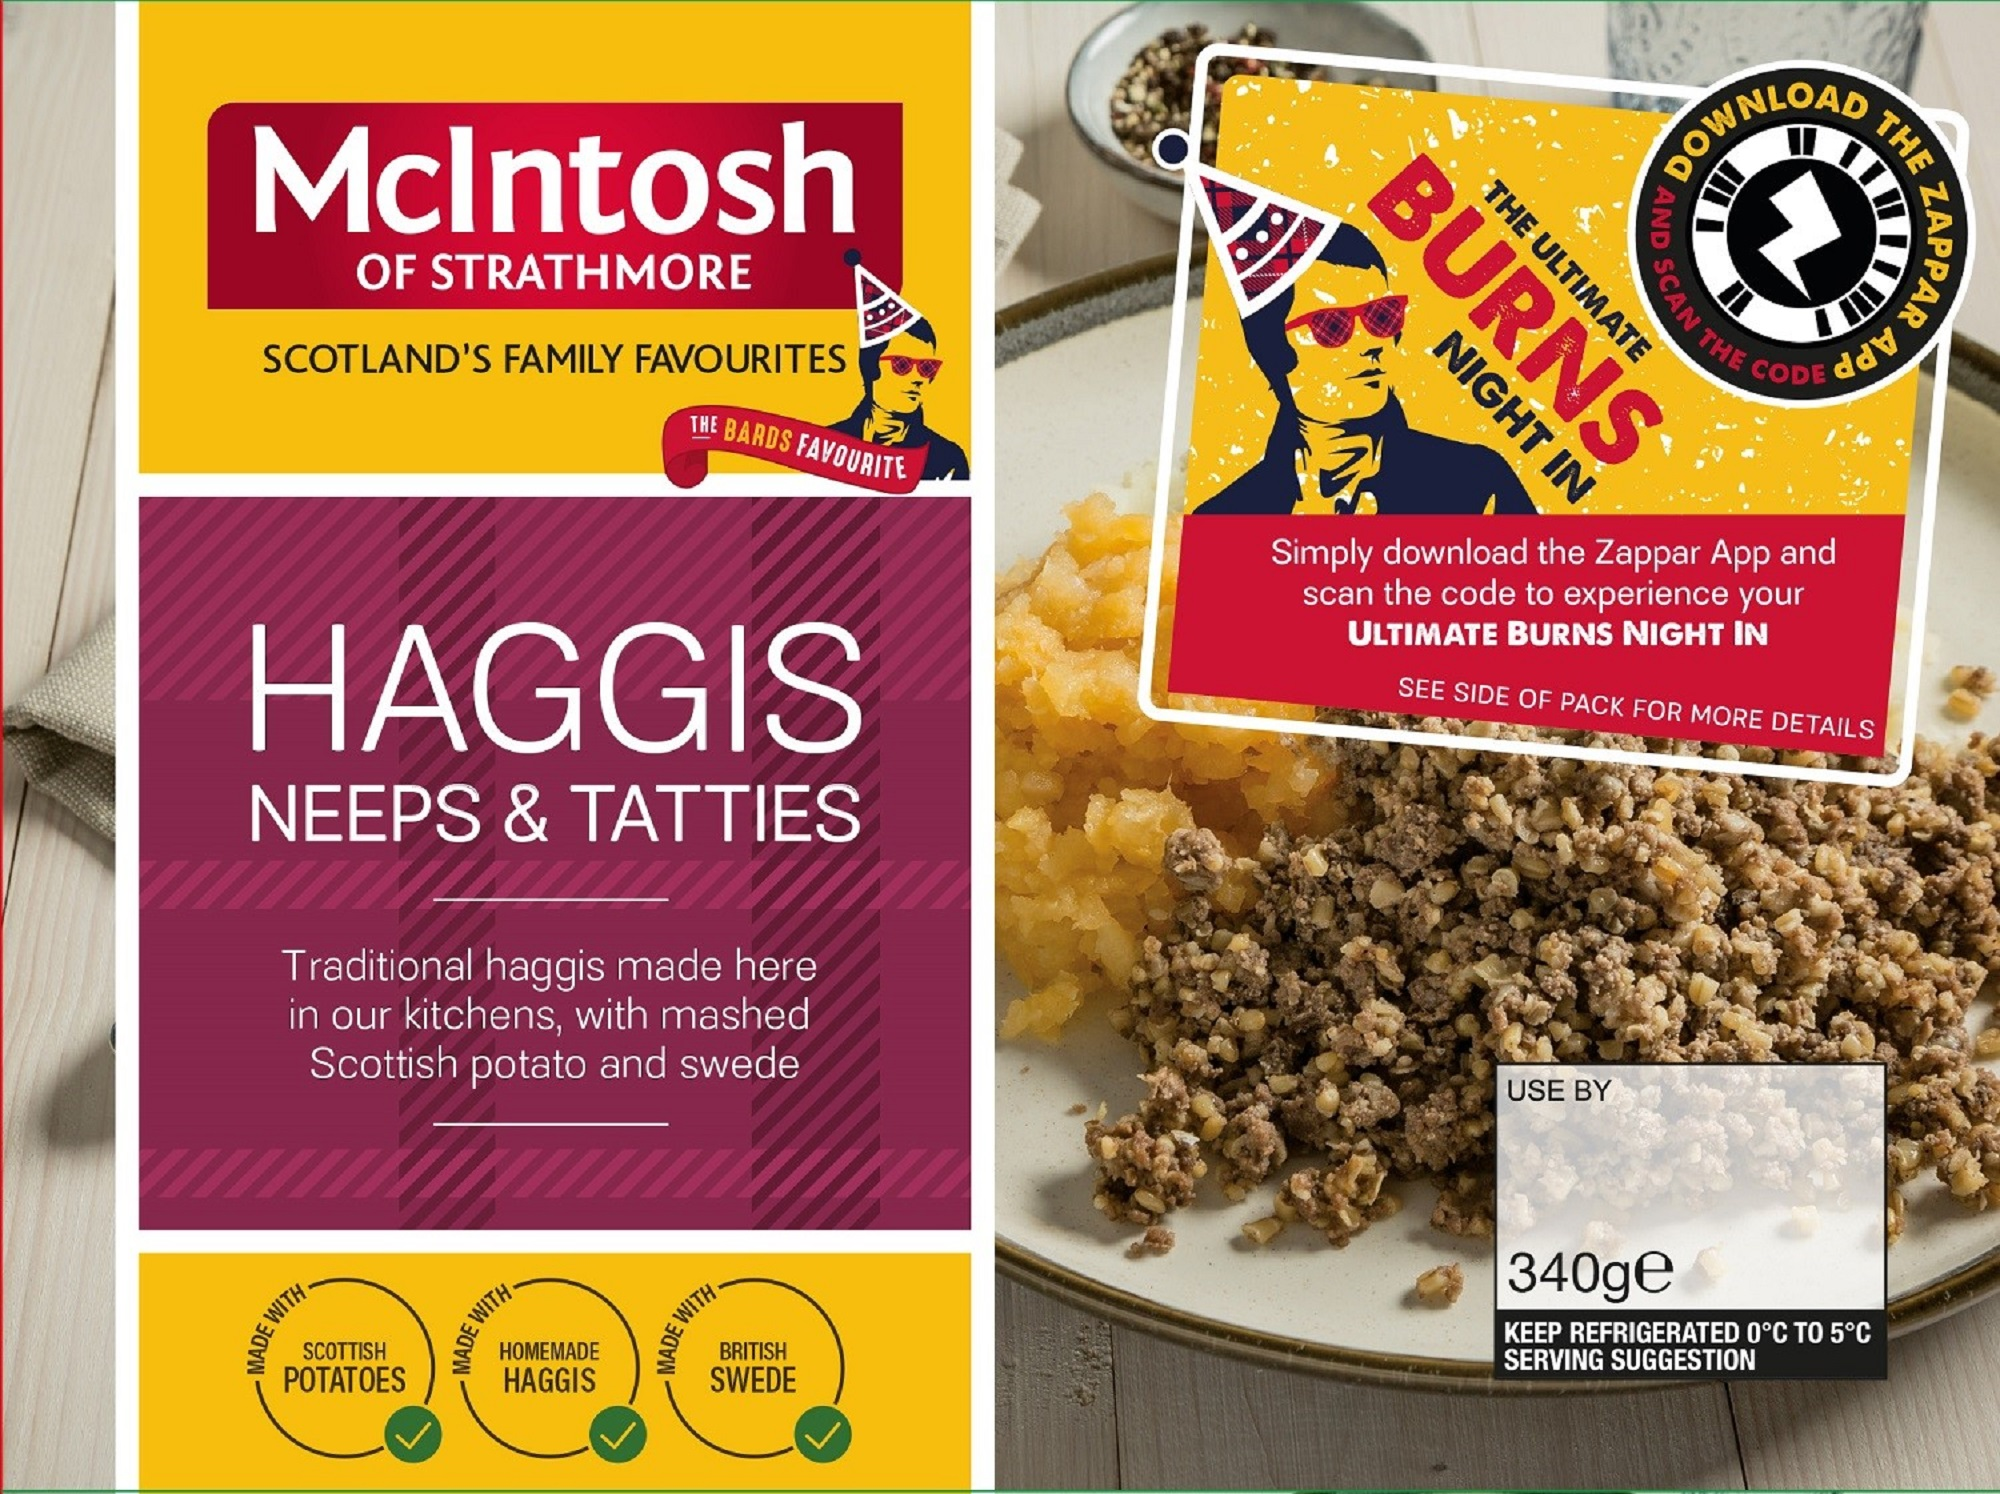 McIntosh Burns pack